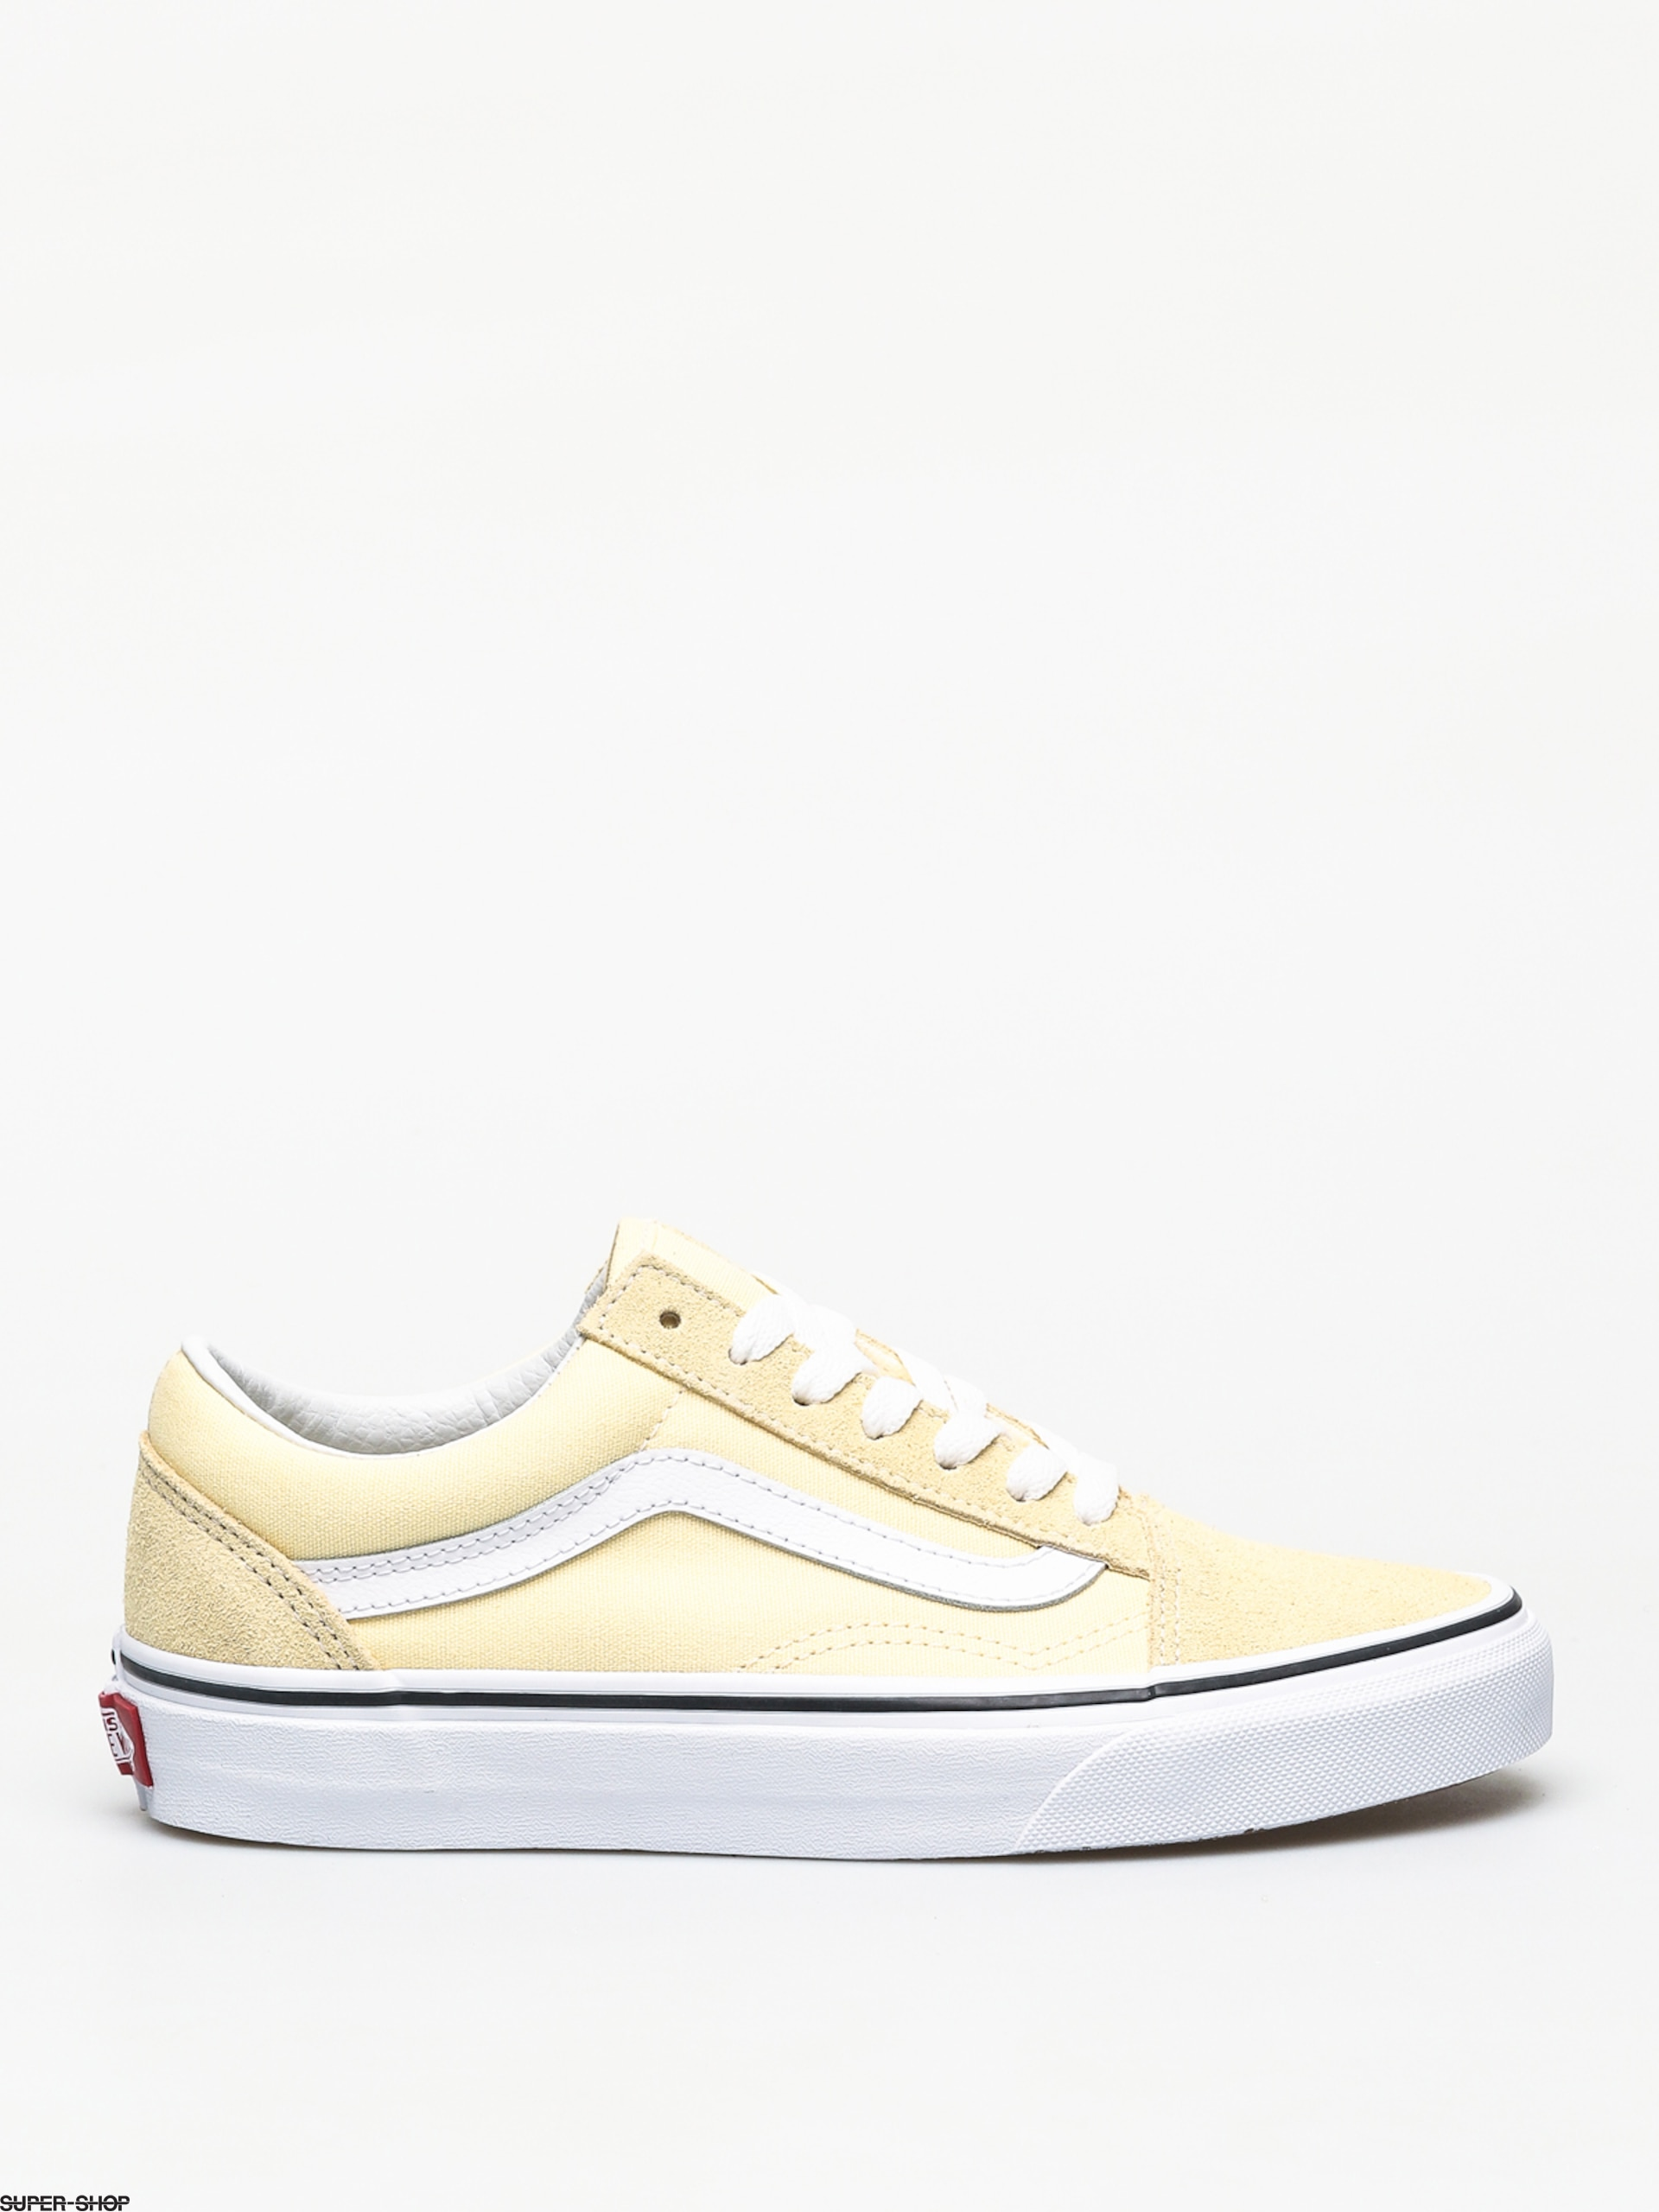 02378d02fe 1012847-w1920-vans-old-skool-shoes-vanilla-custard.jpg